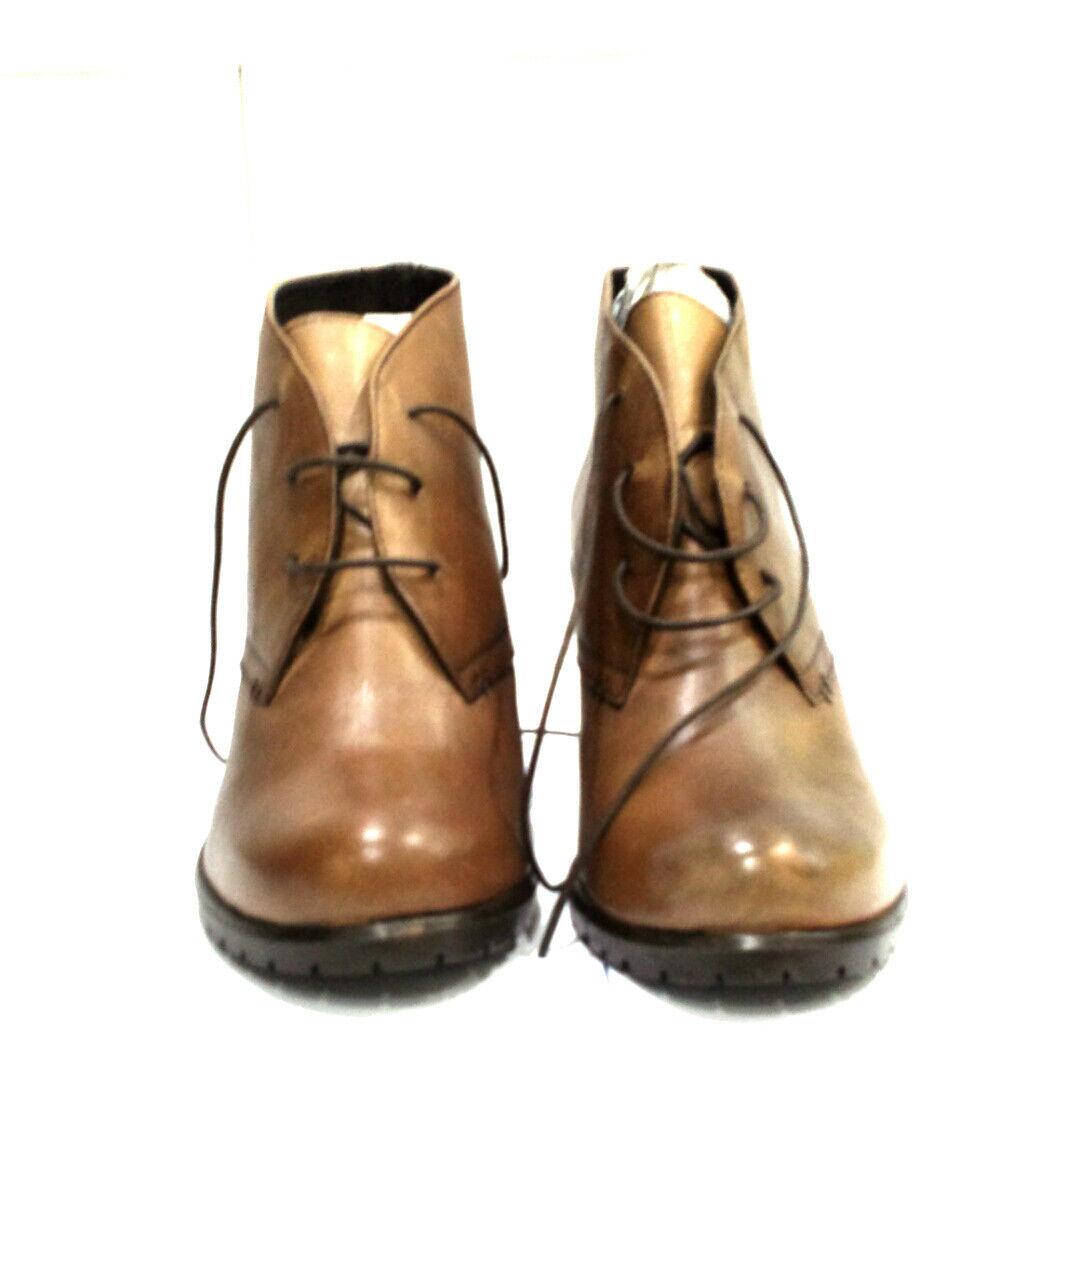 JOHN LEWIS - TARANTO TAN Stiefel - Größe 5 - 20,000+ F BACK  BB153